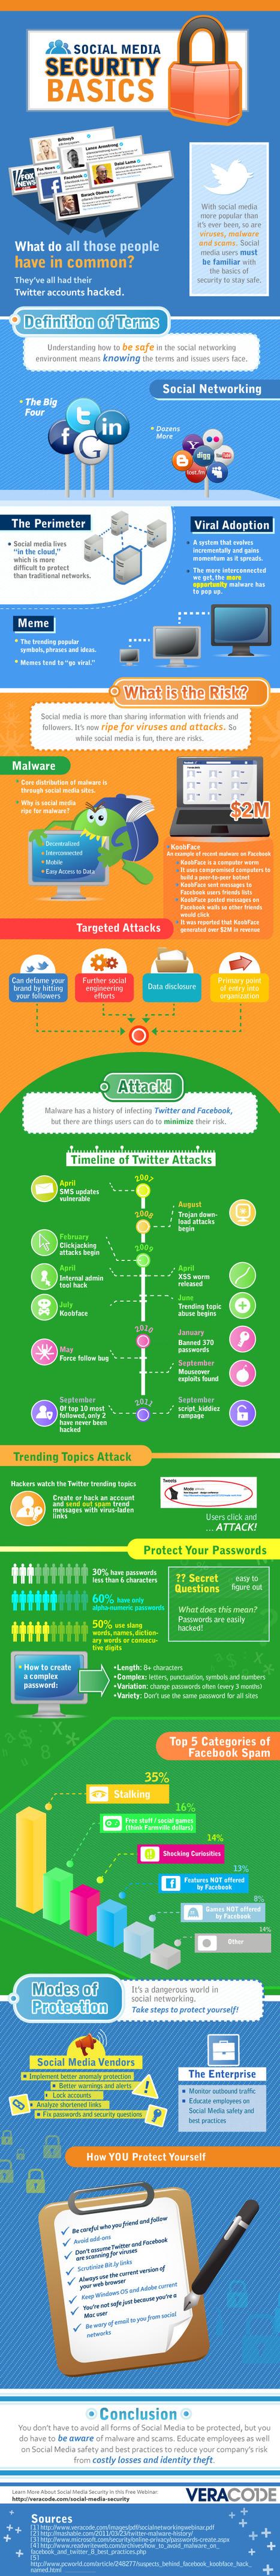 Infographic: Security basics voor sociale media | Media Literacy | Scoop.it